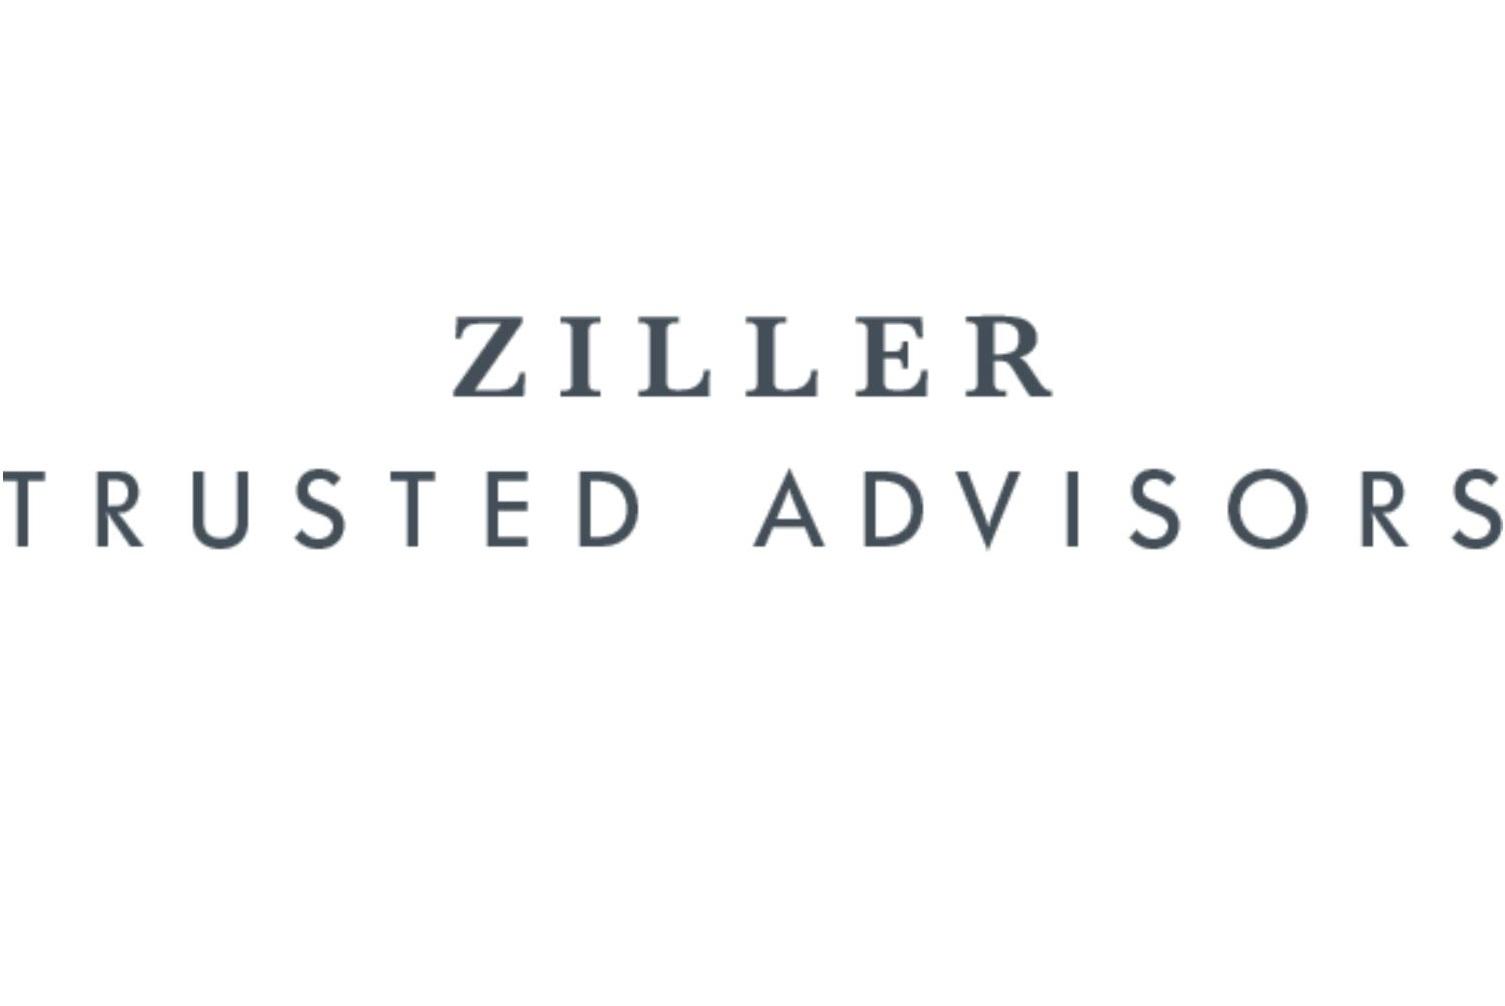 Ziller Trusted Advisors (질러 트러스티드 어드바이져)